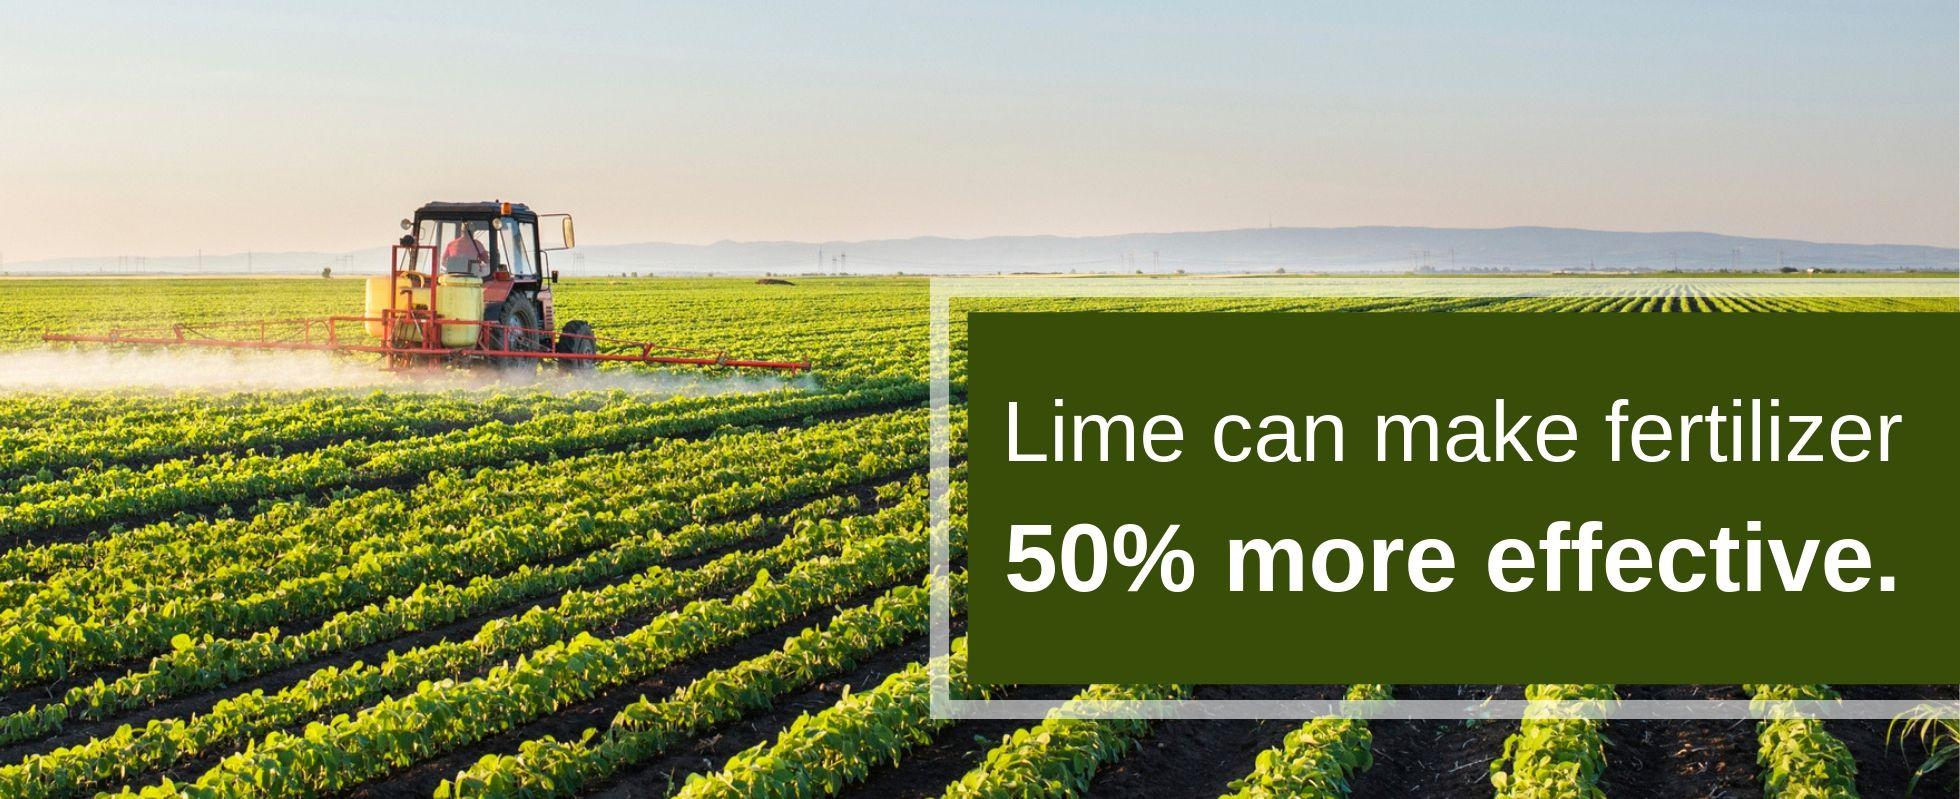 Lime Makes Fertilizer 50% more effective